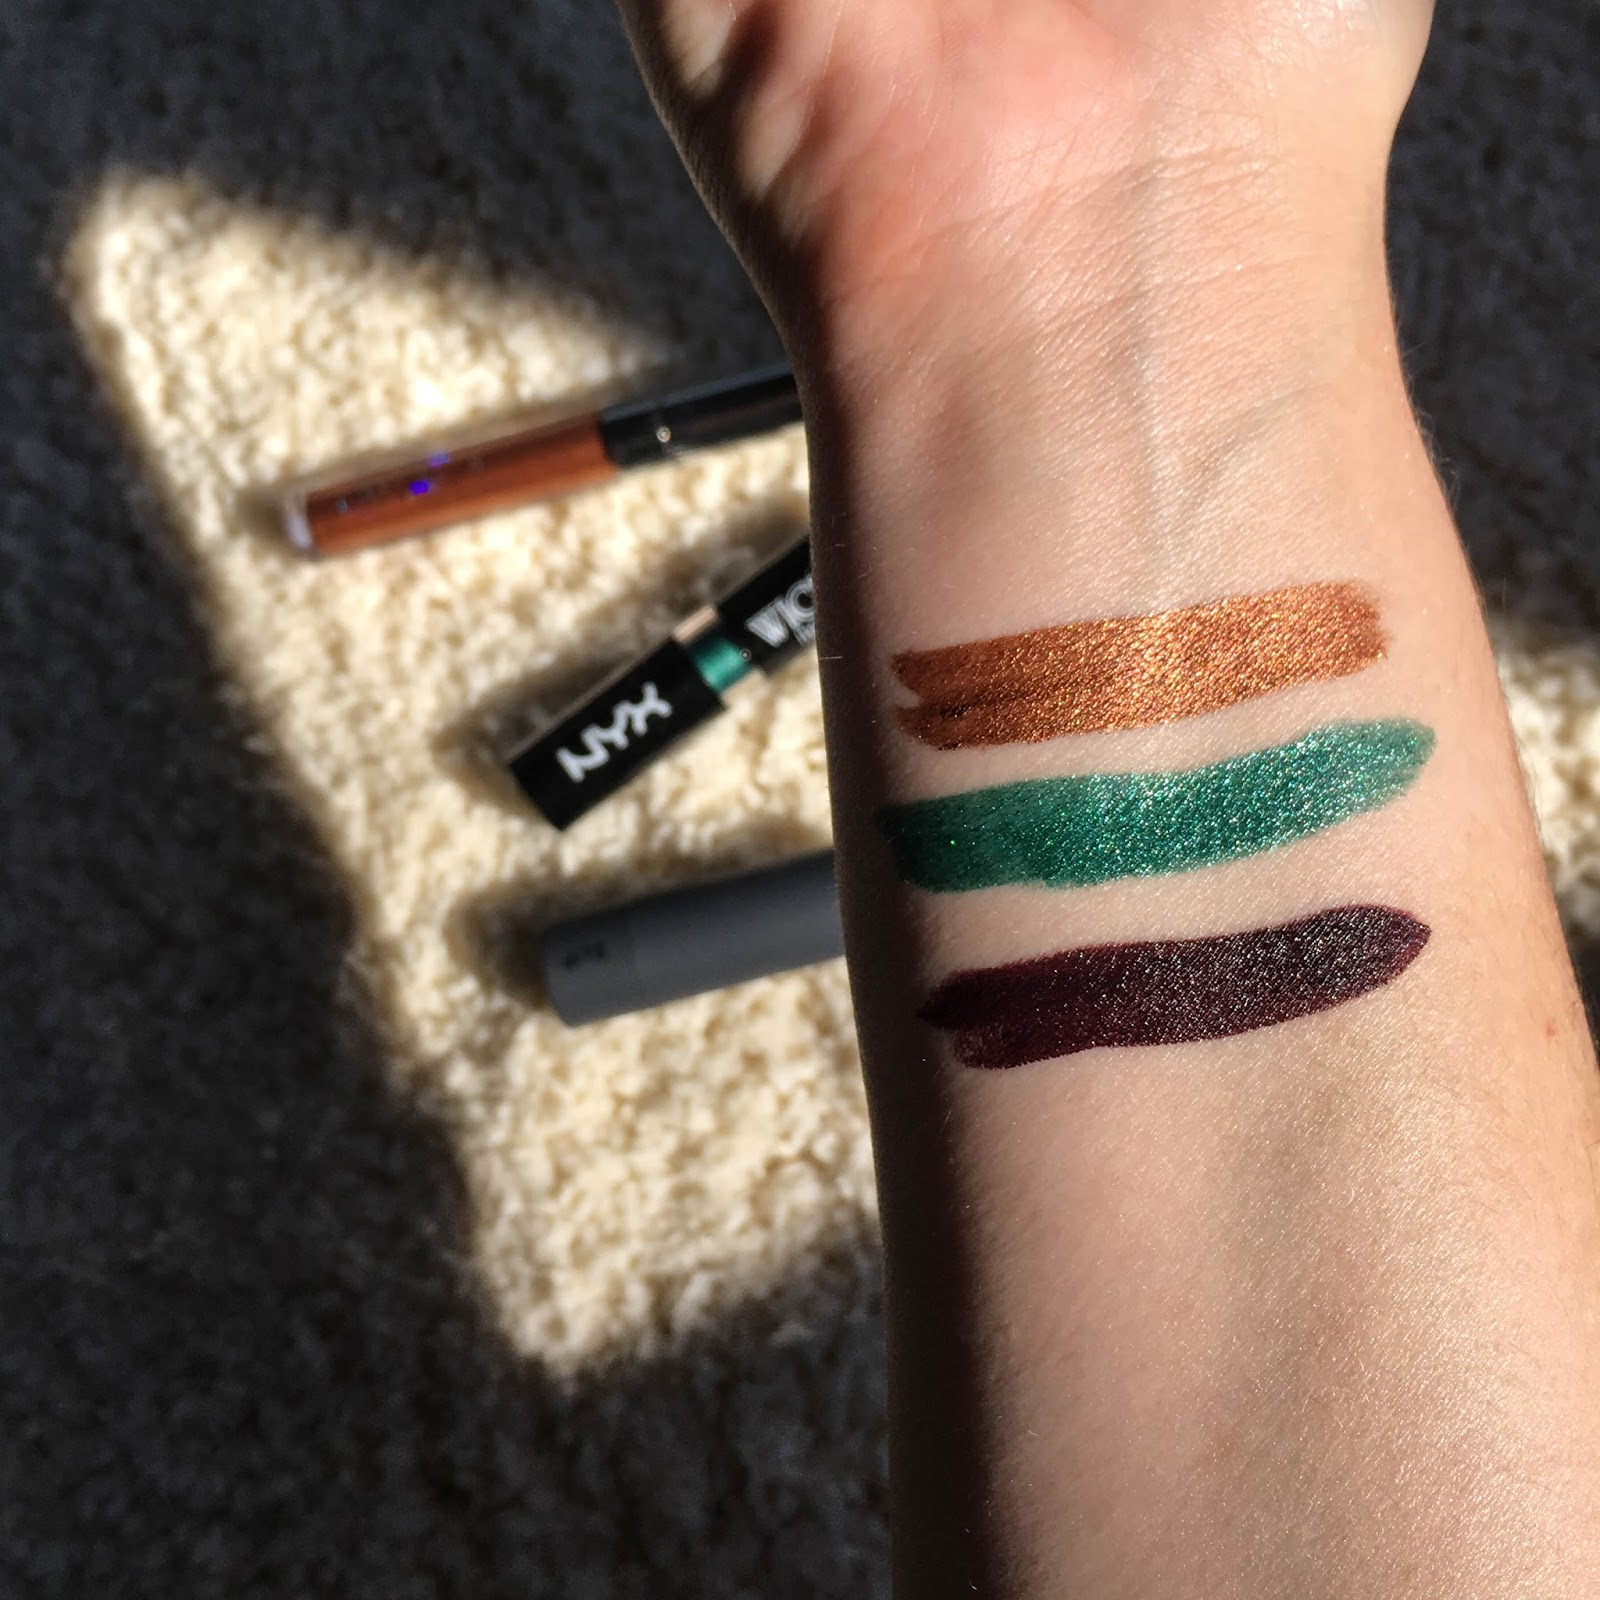 "Swatches of Colourpop Ultra Metallic Lip in ""DM"", Nyx Wicked Lippie in ""Risque"", and Bite Beauty Amuse Bouche Lipstick in ""Black Truffle"""